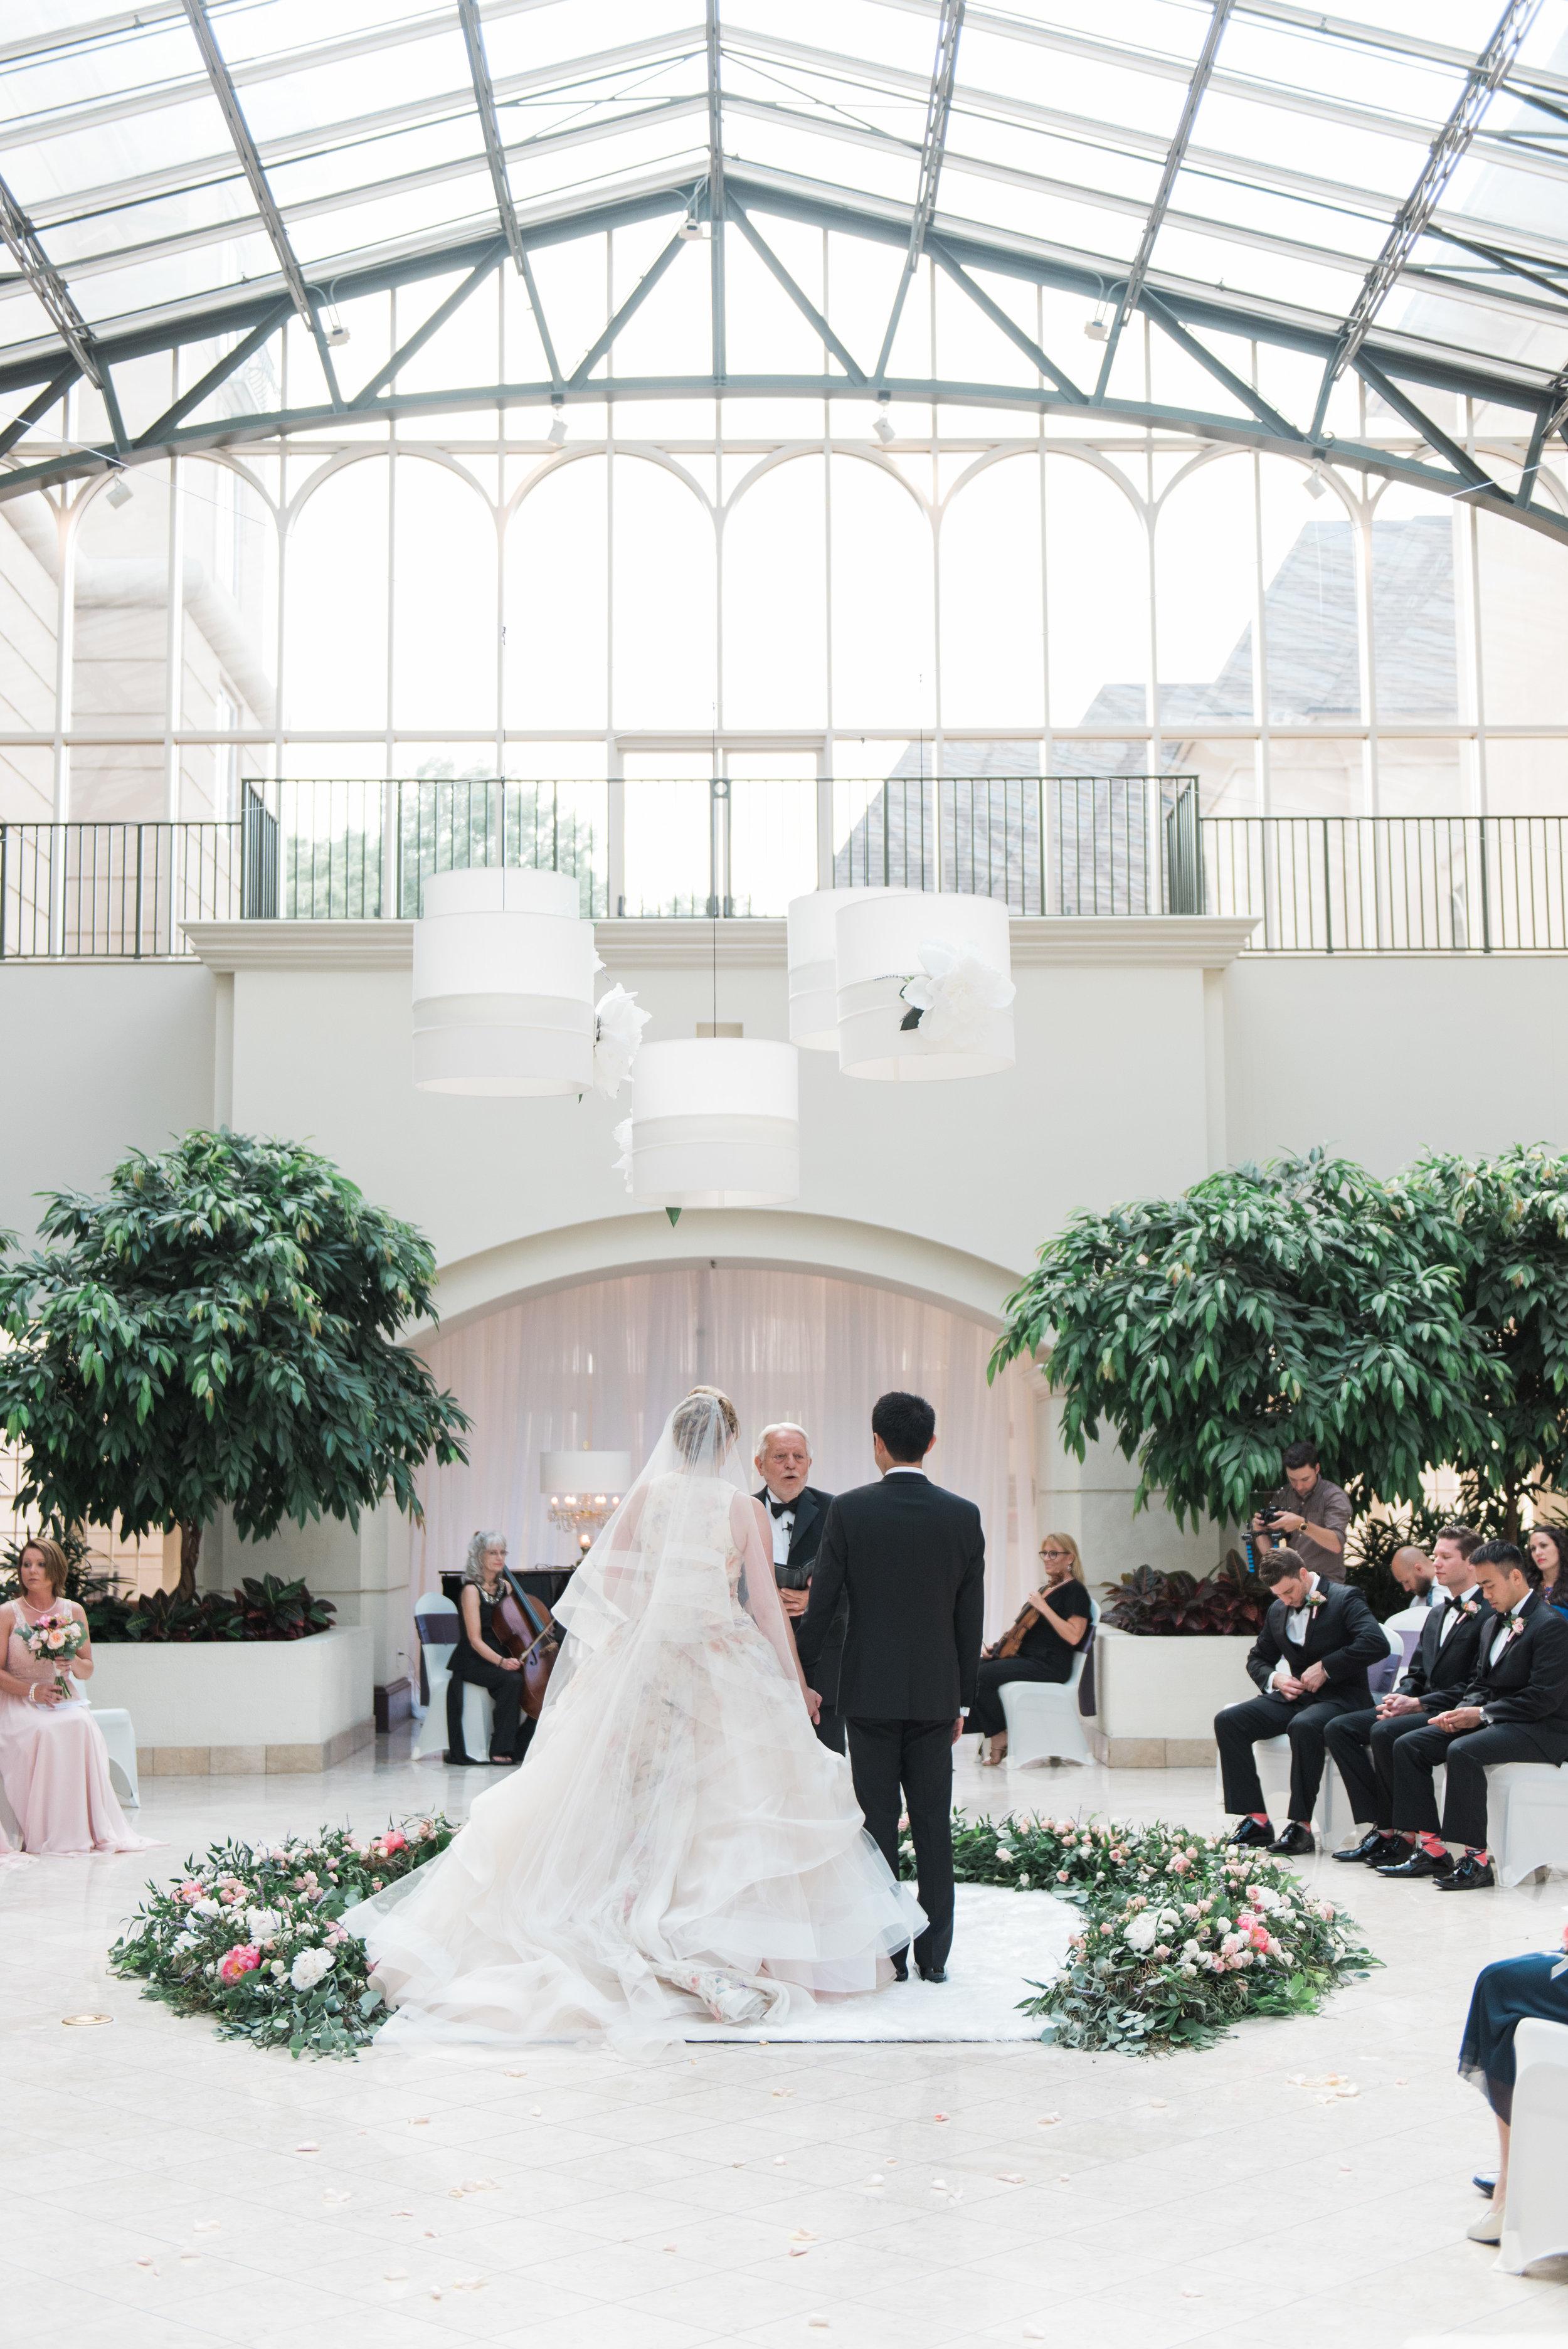 hwang wedding-539.jpg